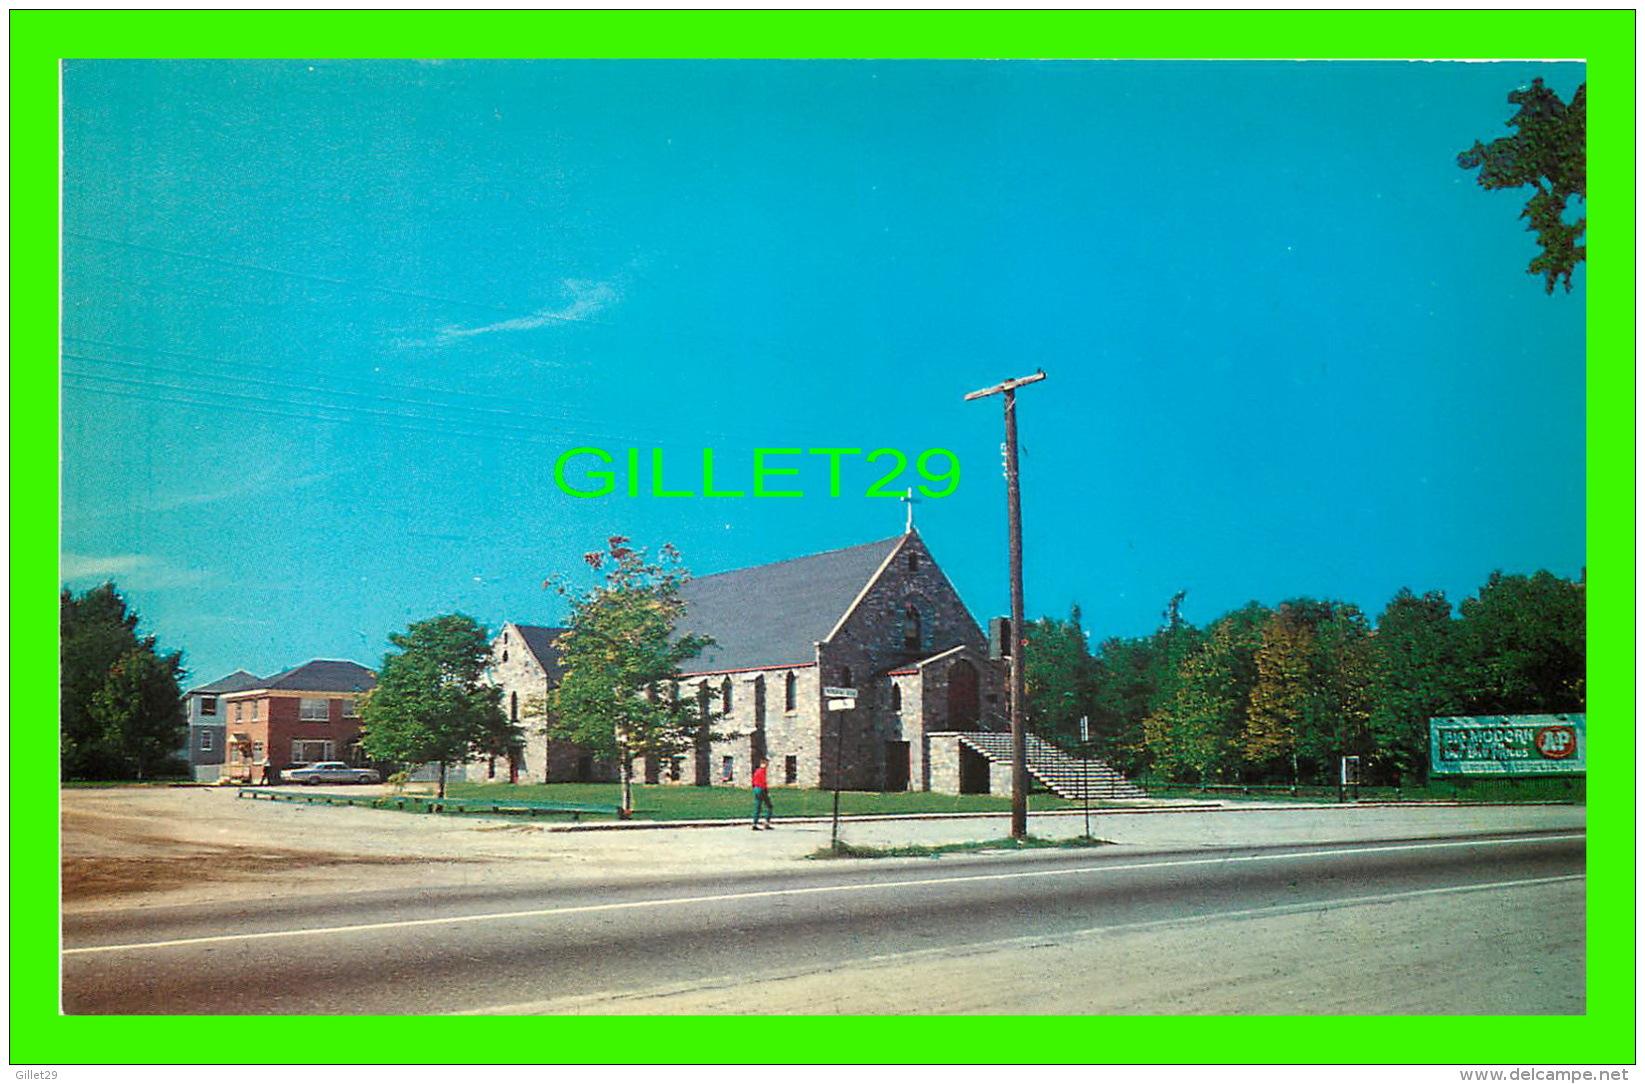 NORTH BAY, ONTARIO - HOLY NAME CHURCH, ROMAN CATHOLIC - WORLD WIDE SALES AGENCIES LTD - - North Bay